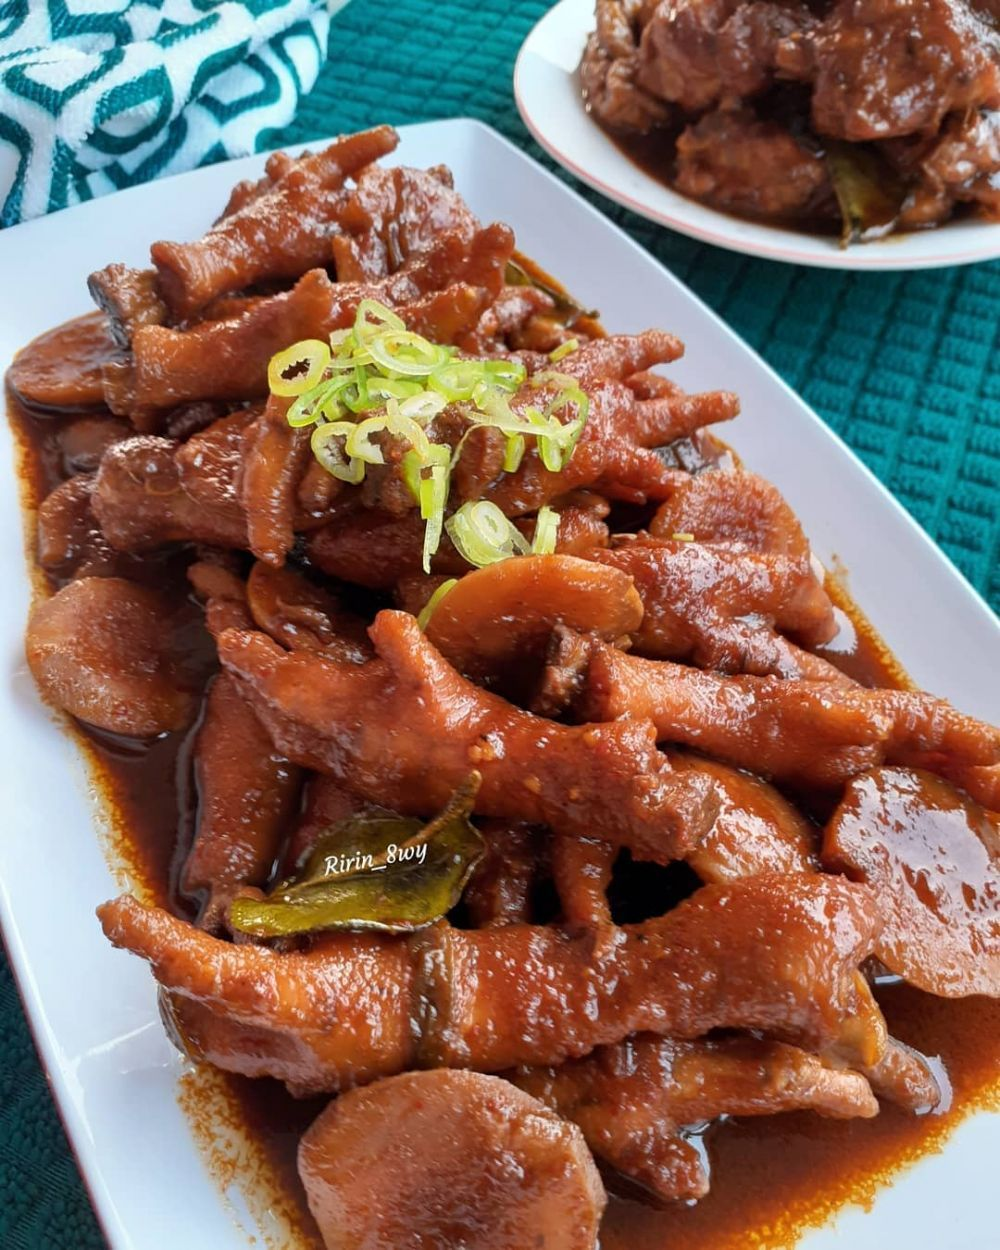 Resep Ayam Kuah Instagram Di 2020 Resep Ayam Resep Masakan Resep